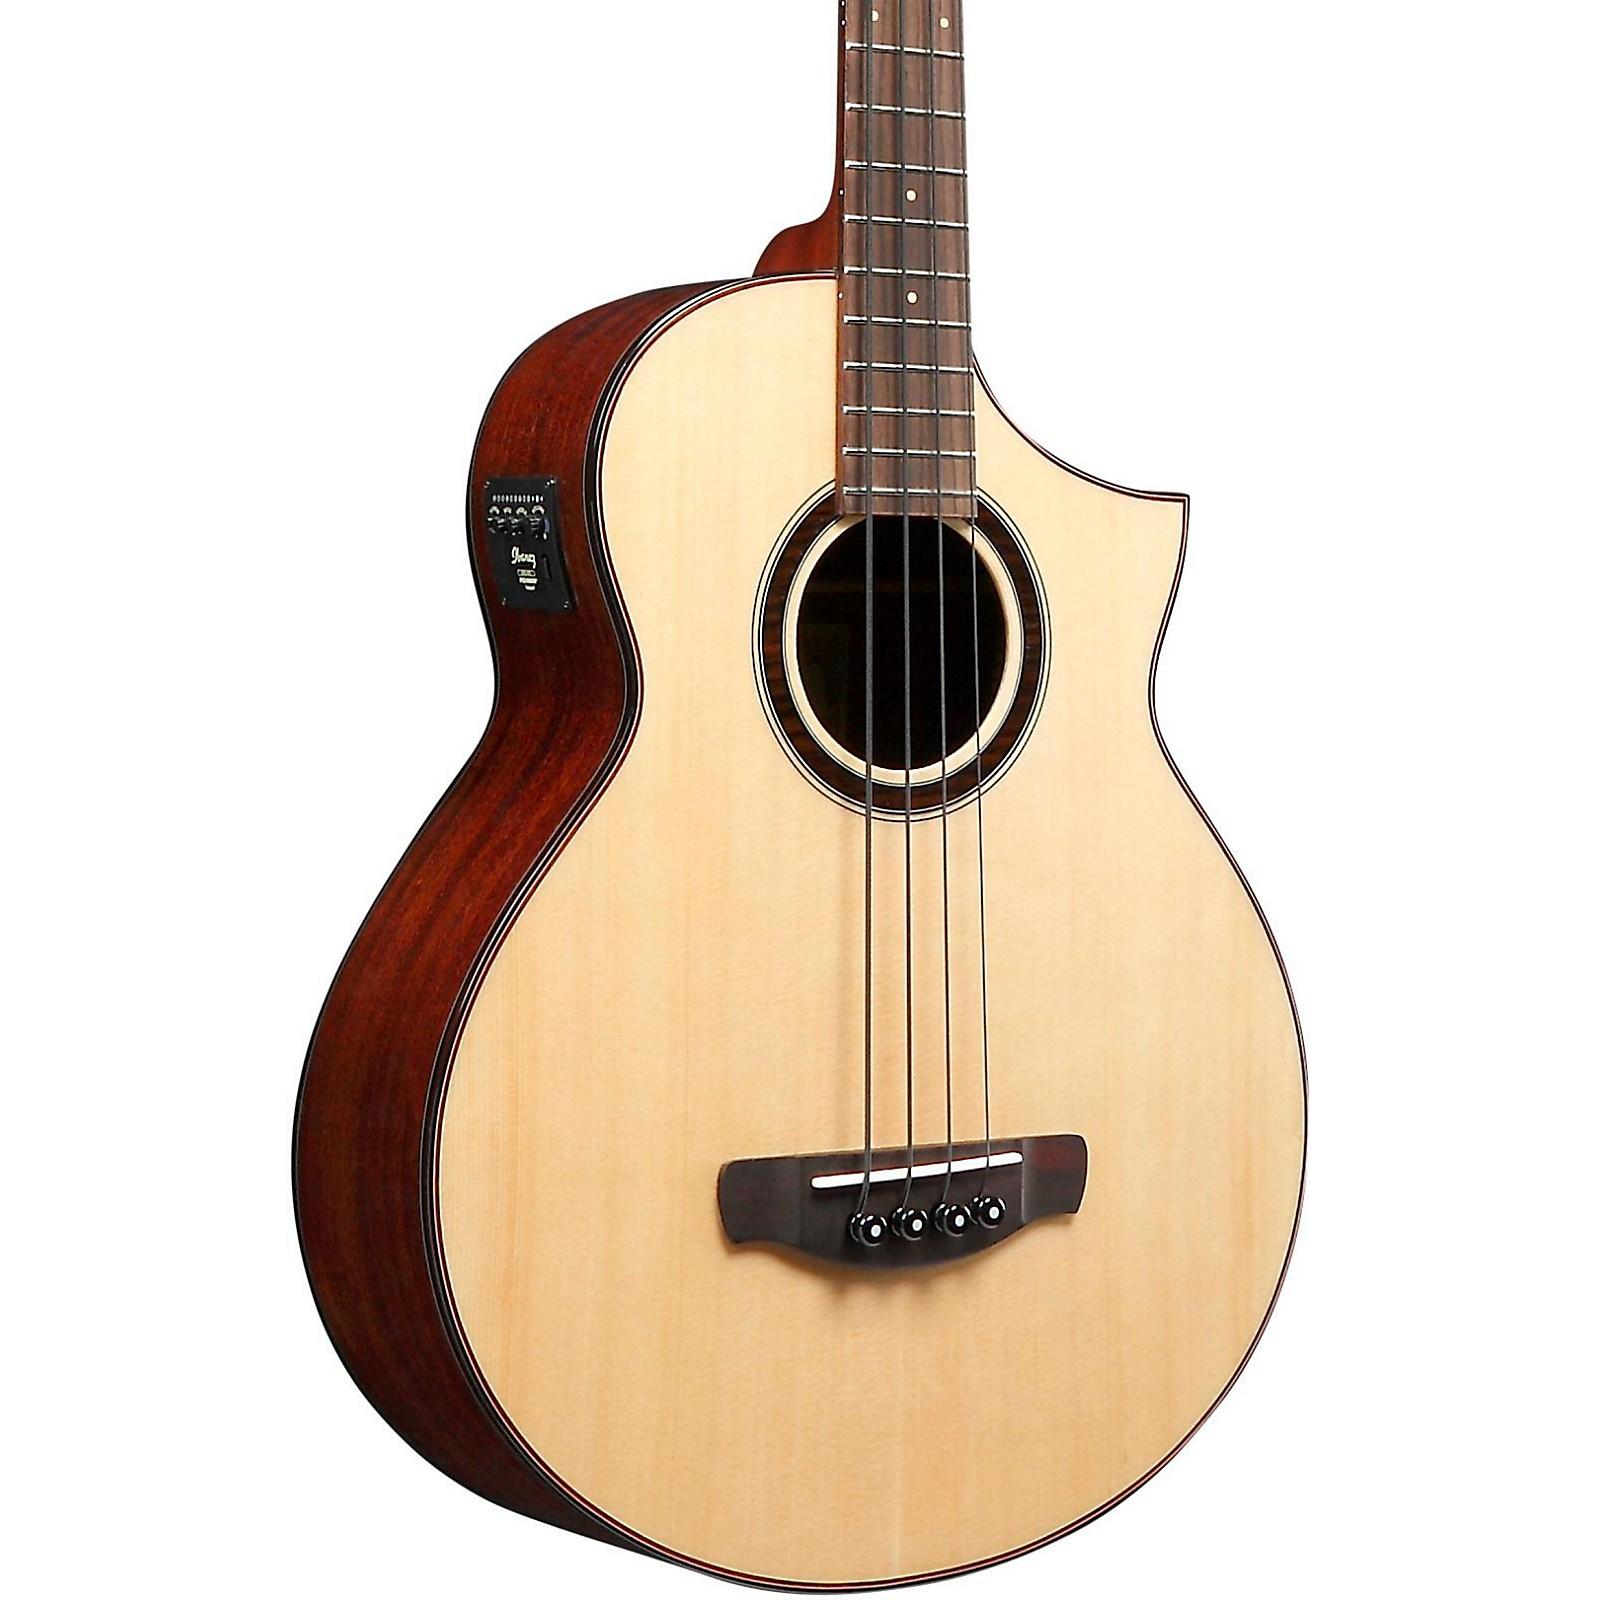 Ibanez AEW Series AEWB20NT Acoustic-Electric Bass Guitar